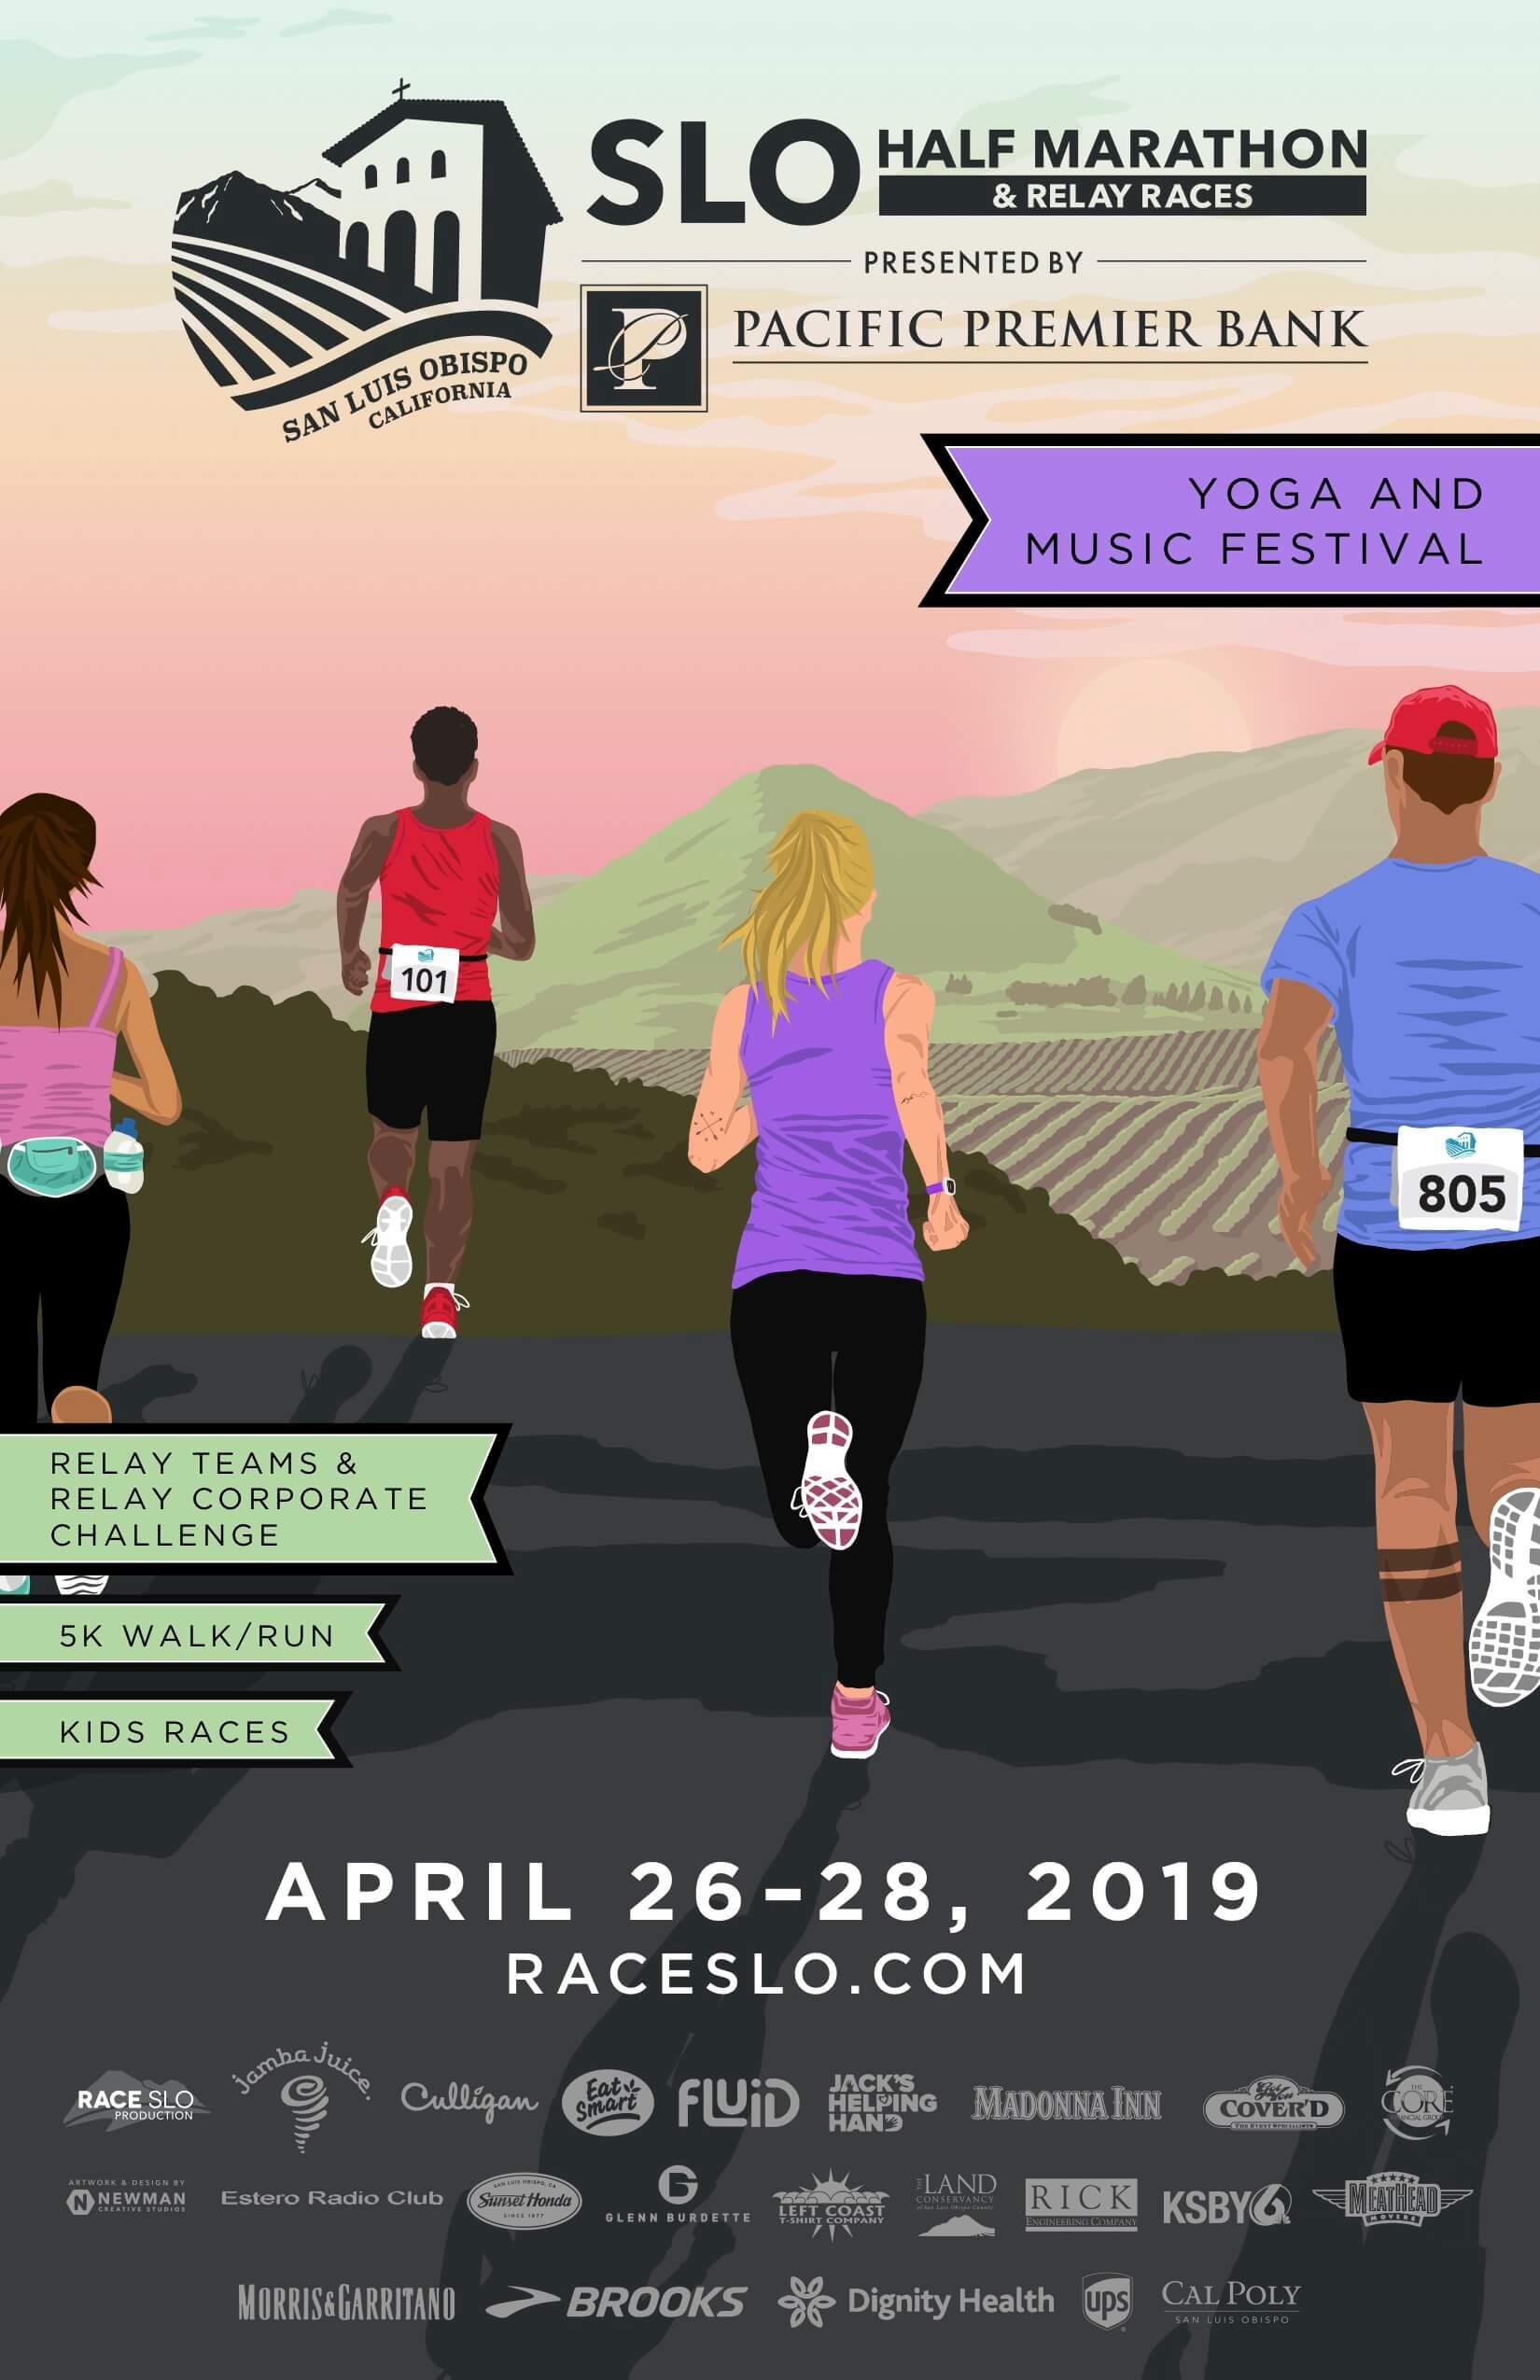 SLO Half Marathon Event Poster